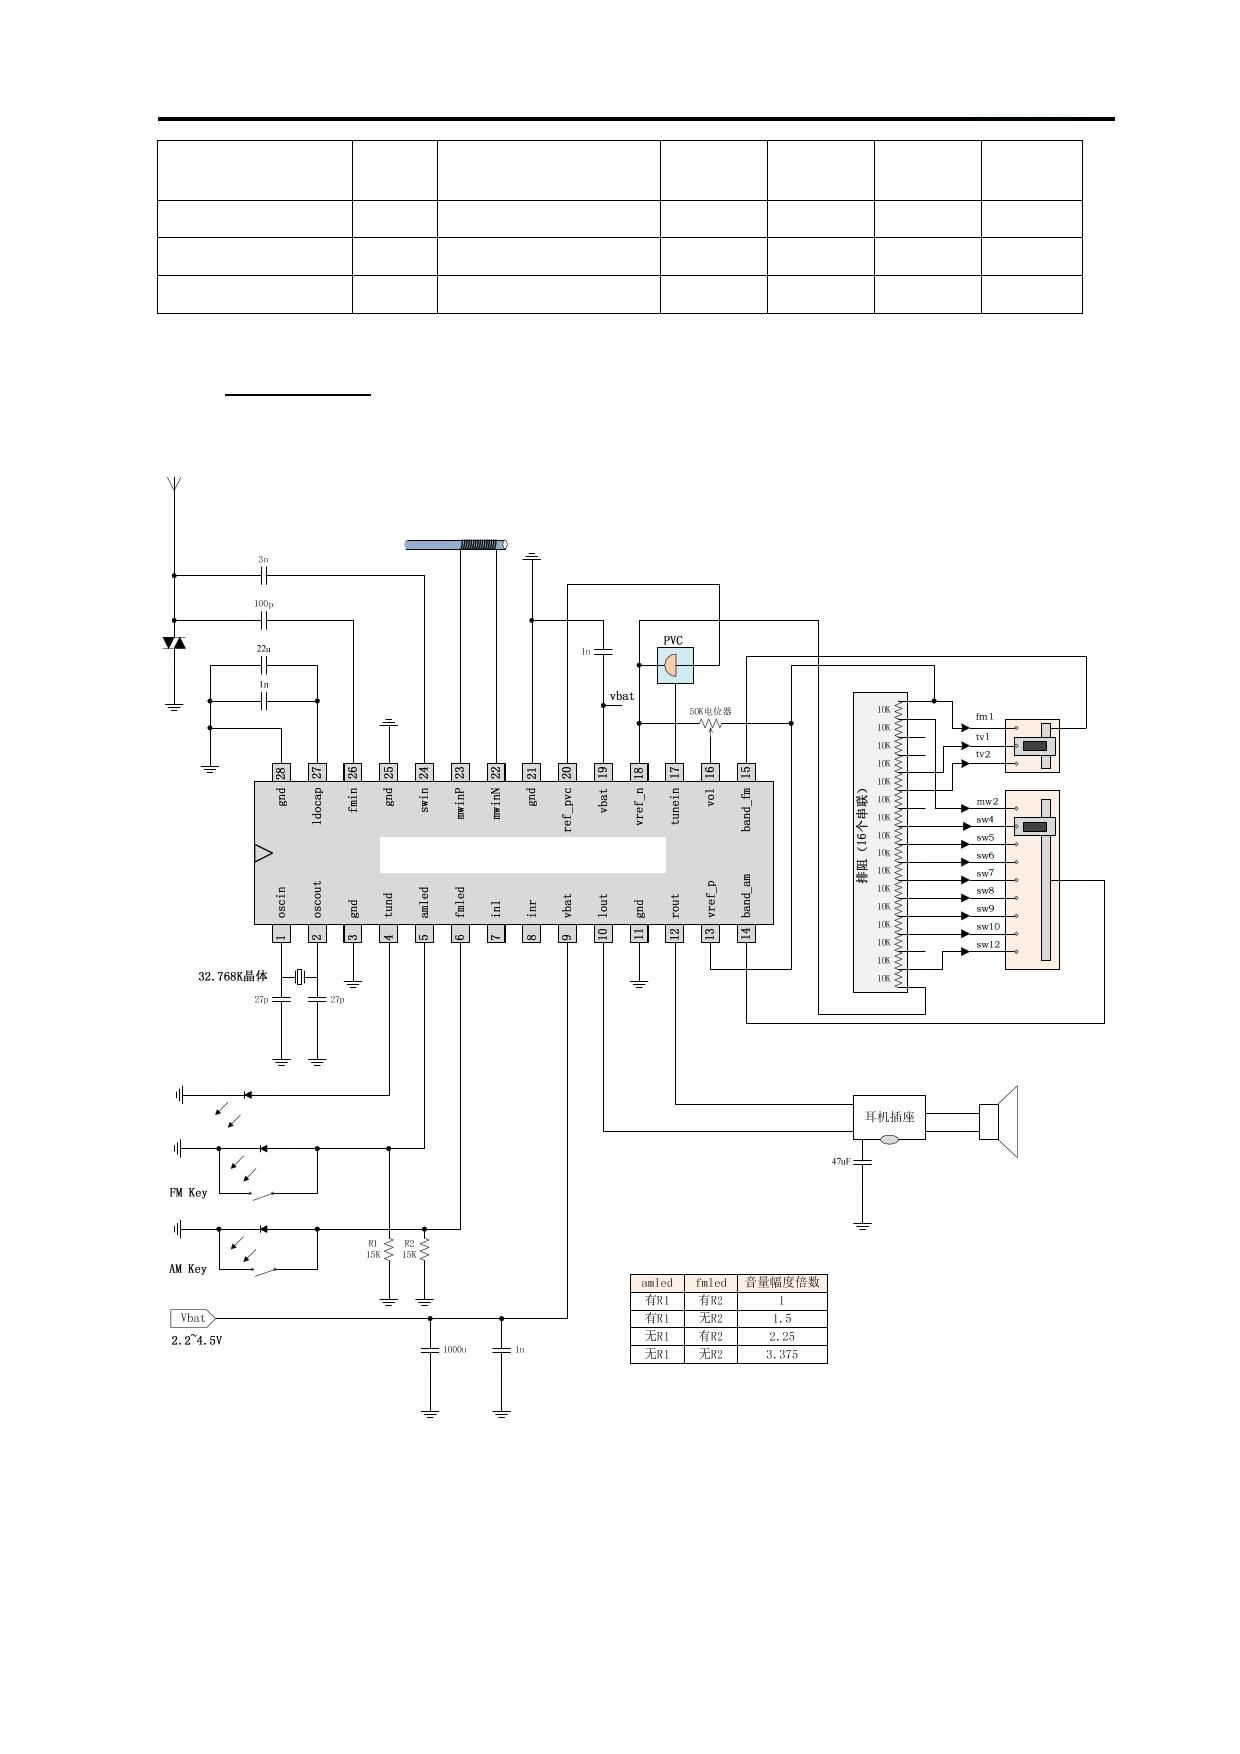 DSP6959 電子部品, 半導体